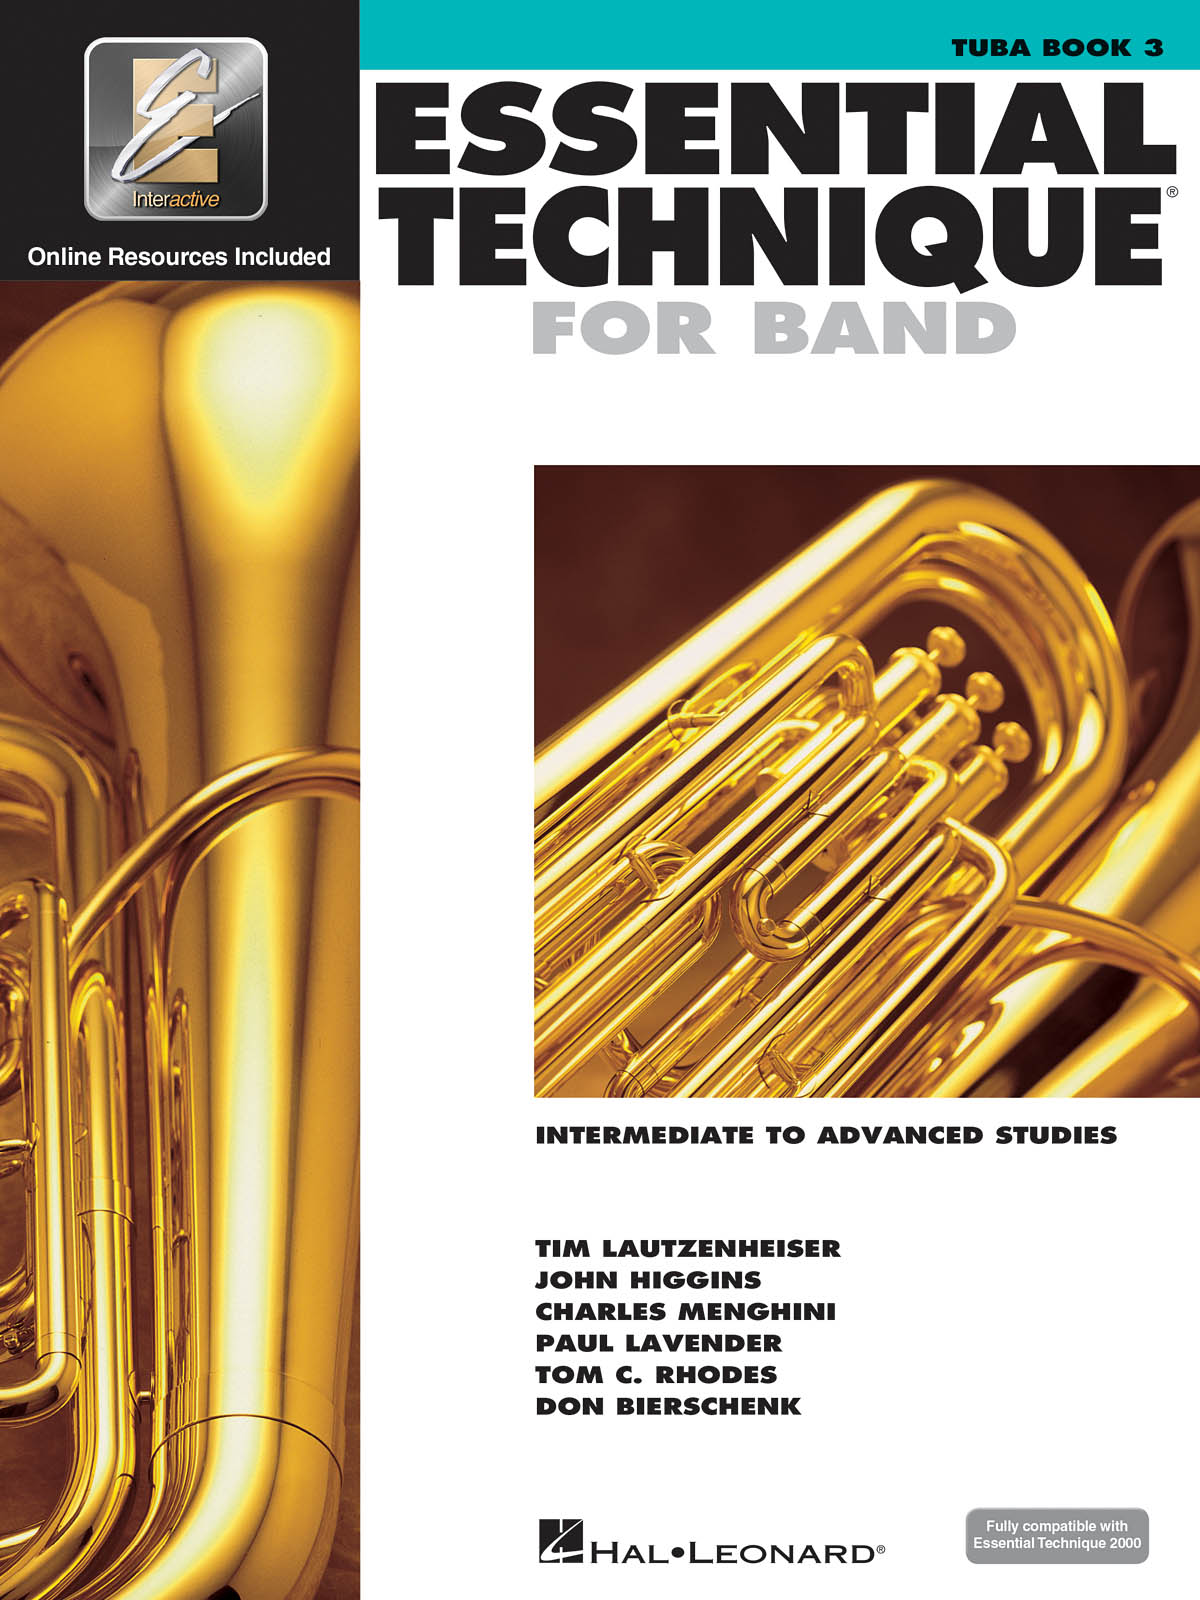 Essential Elements for Band - Book 3 - Tuba: Tuba Solo: Book & Audio